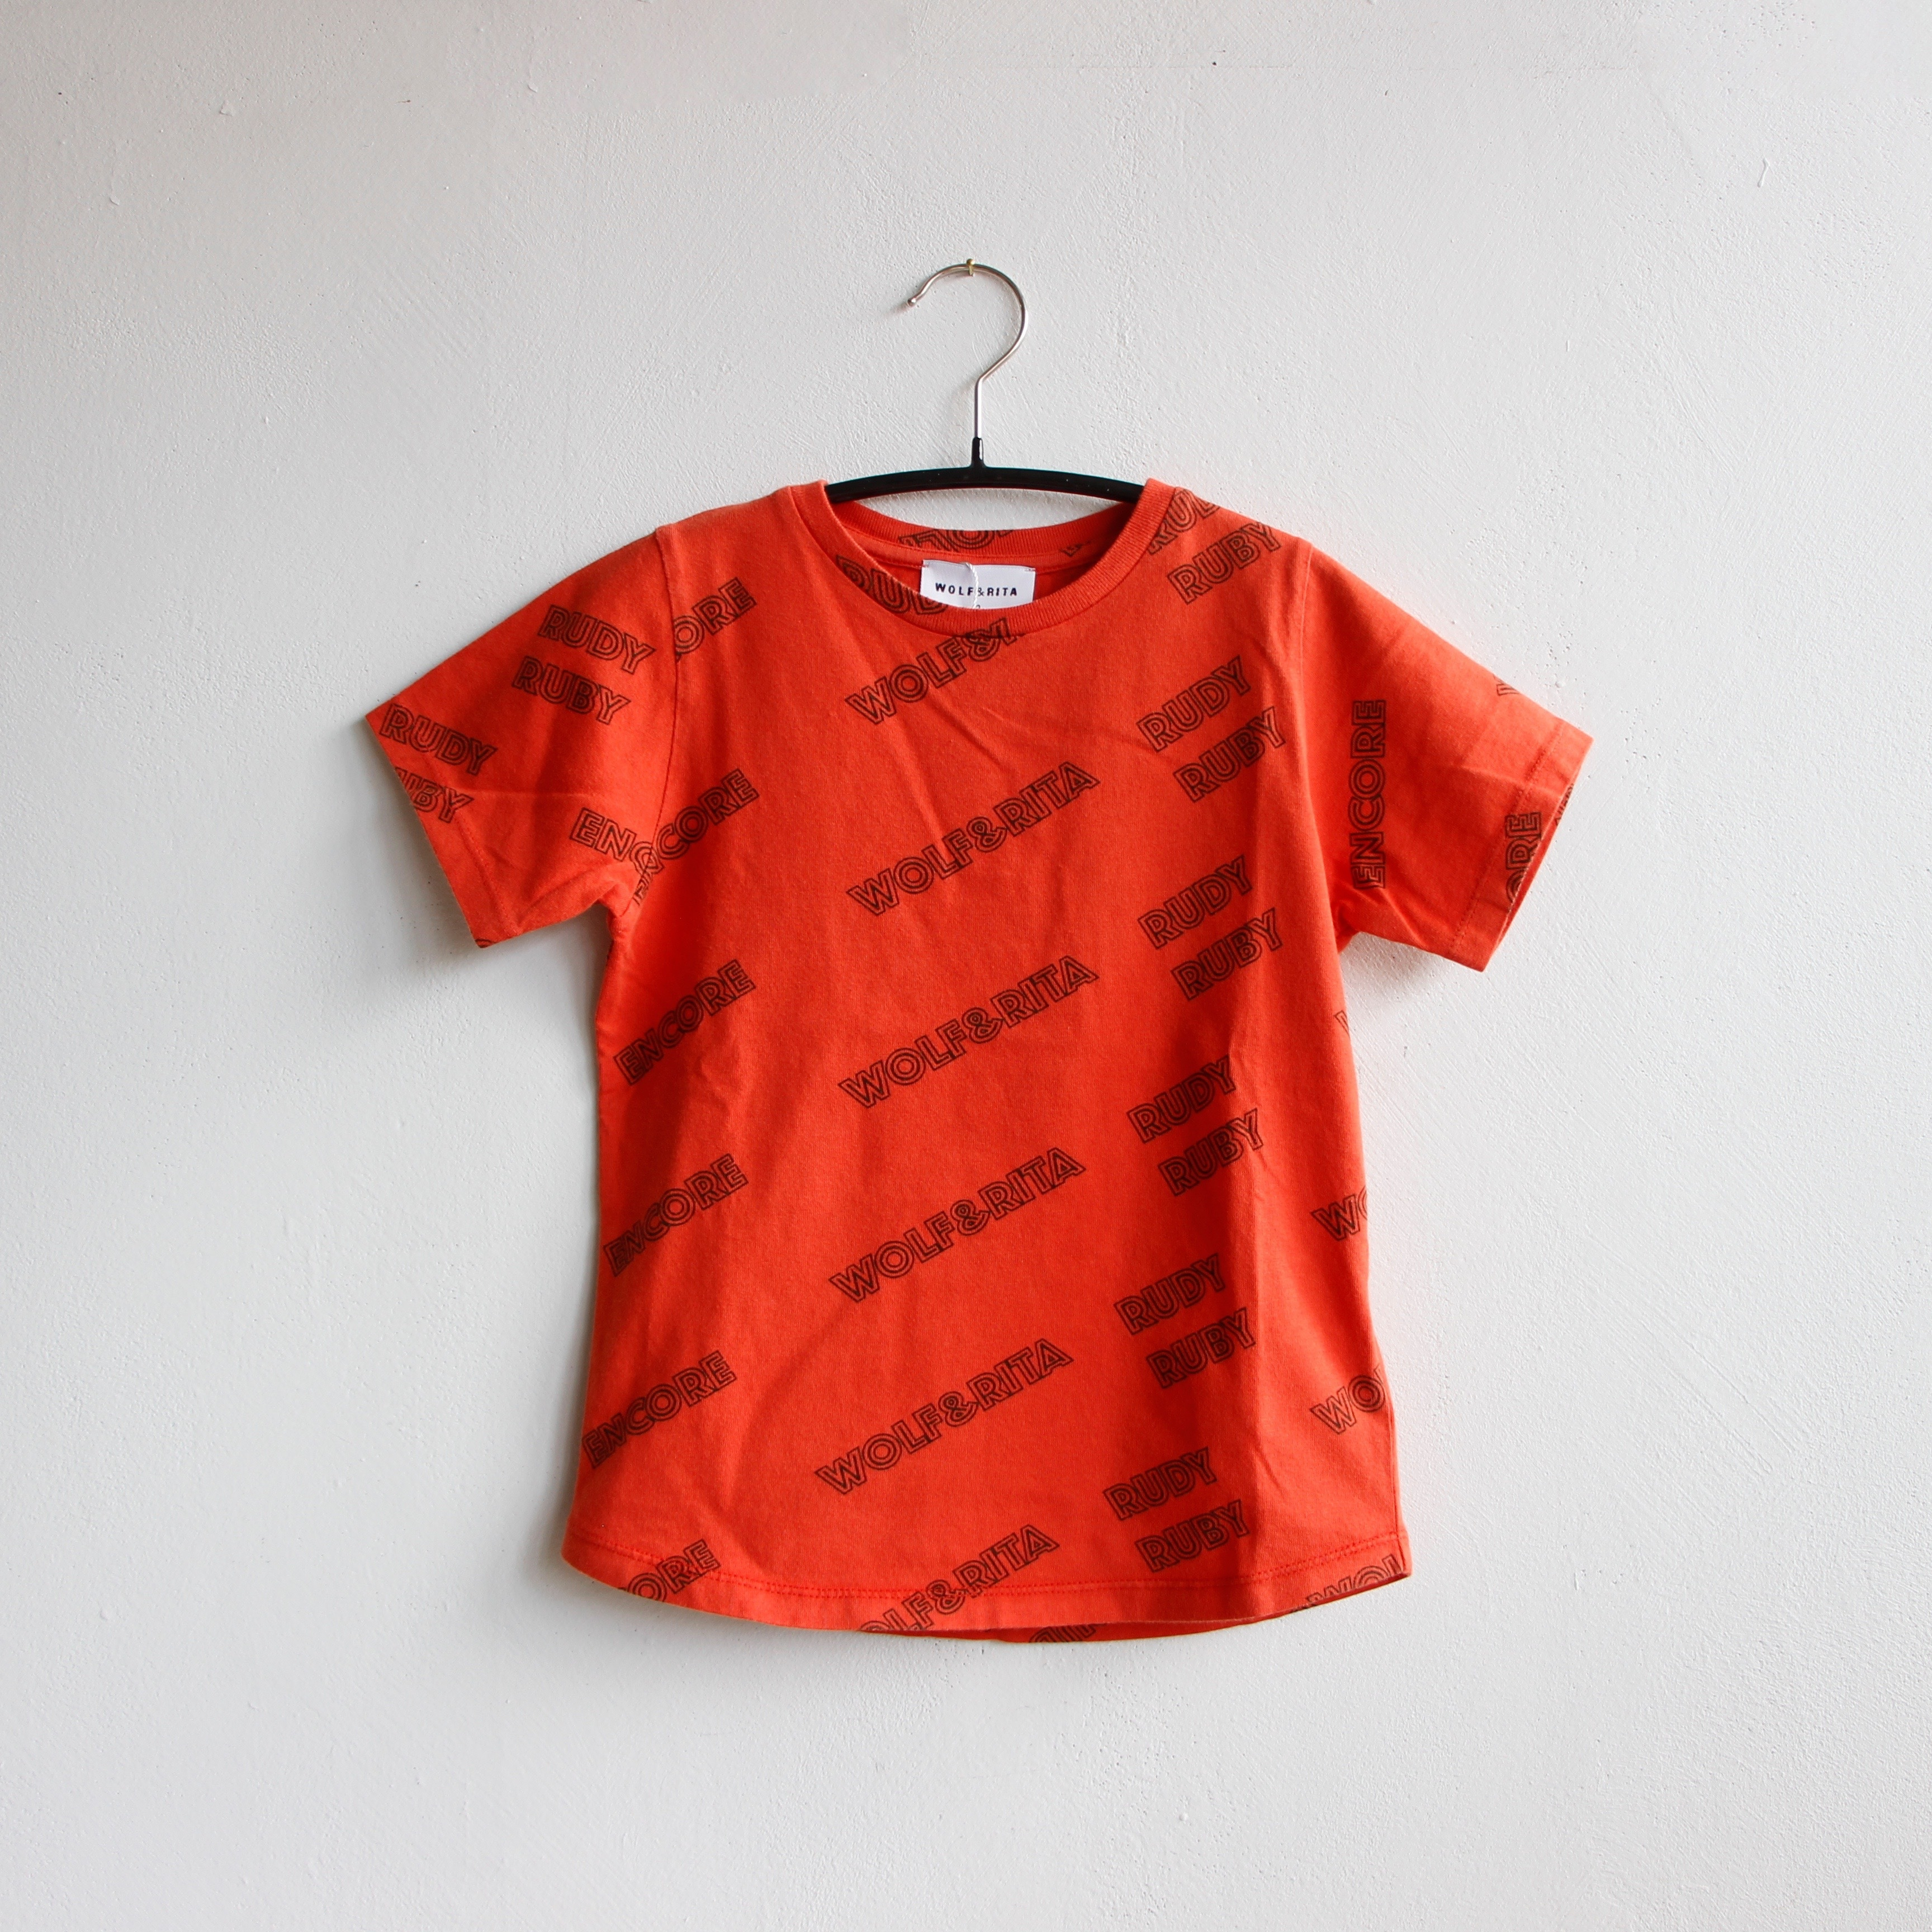 《WOLF & RITA 2020SS》 SEBASTIAO T-shirt / RUDY RUBY RED